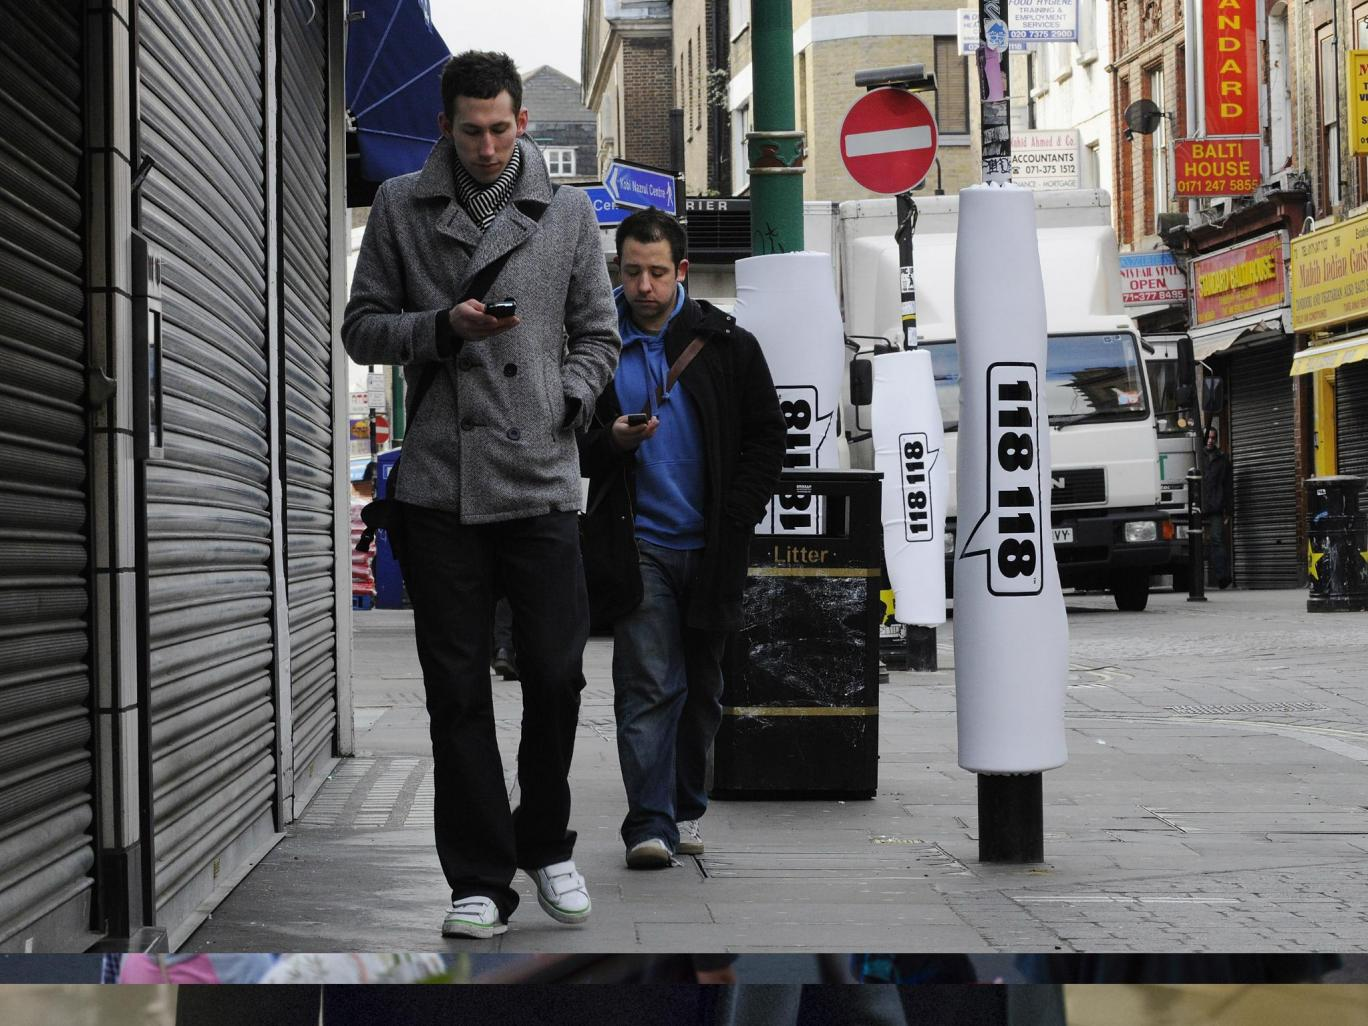 pedestrian-london.jpg